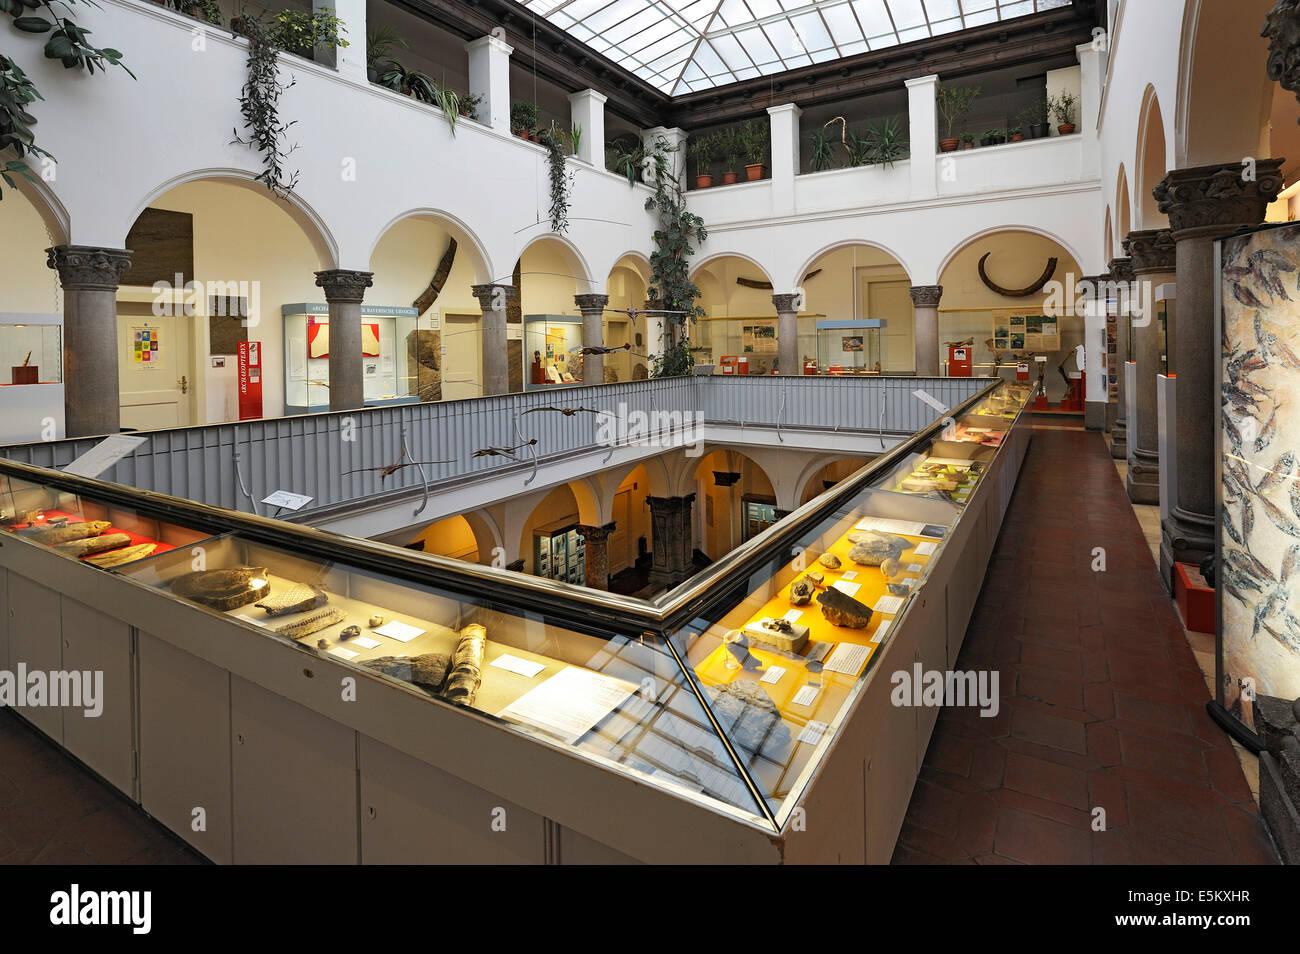 Primer piso, museo Paleontológico, Munich, Baviera, Alemania Imagen De Stock